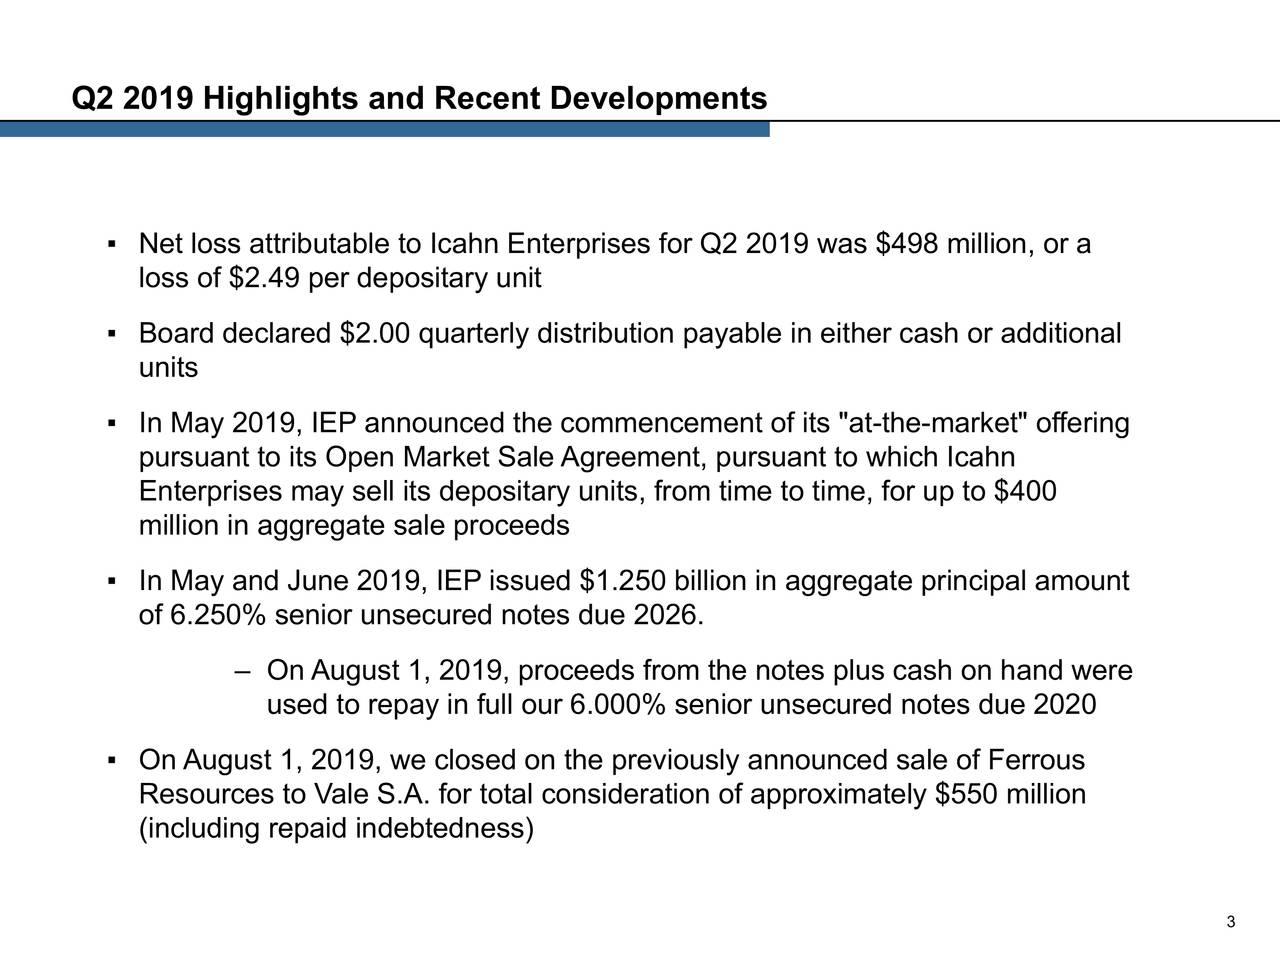 Q2 2019 Highlights and Recent Developments